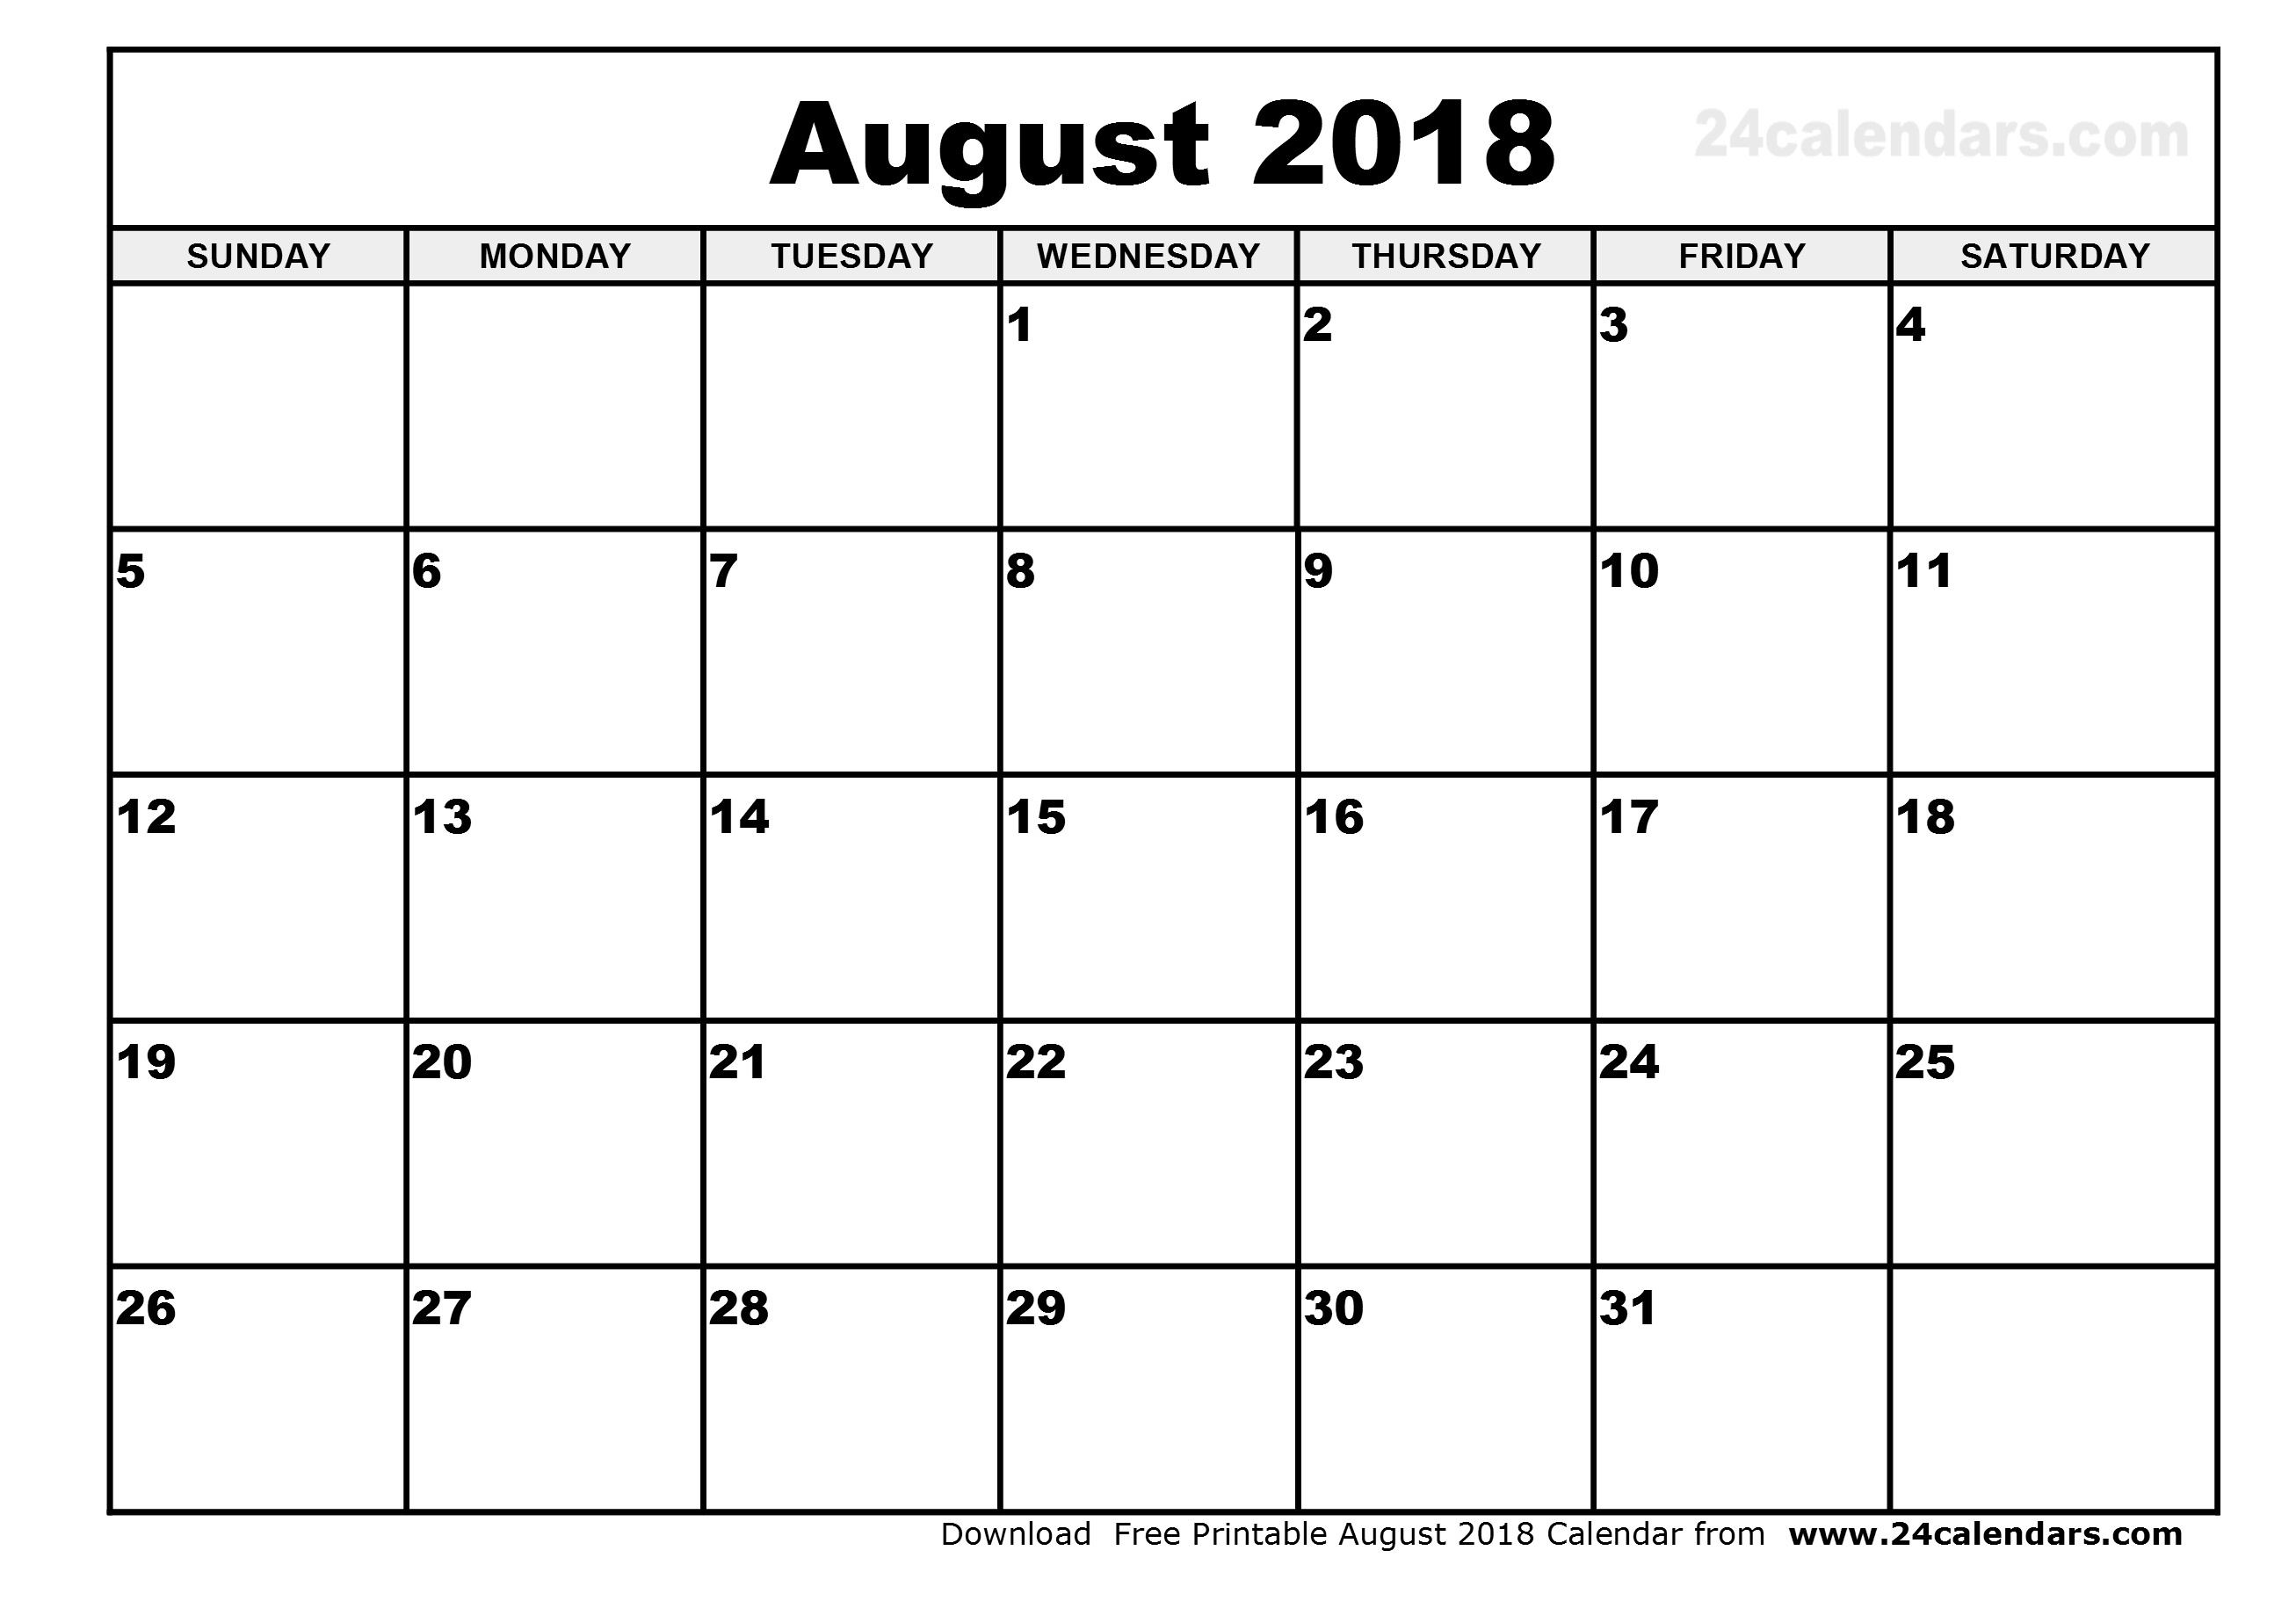 August 2018 Calendar | Month Printable Calendar  August Printable Calendar By Month